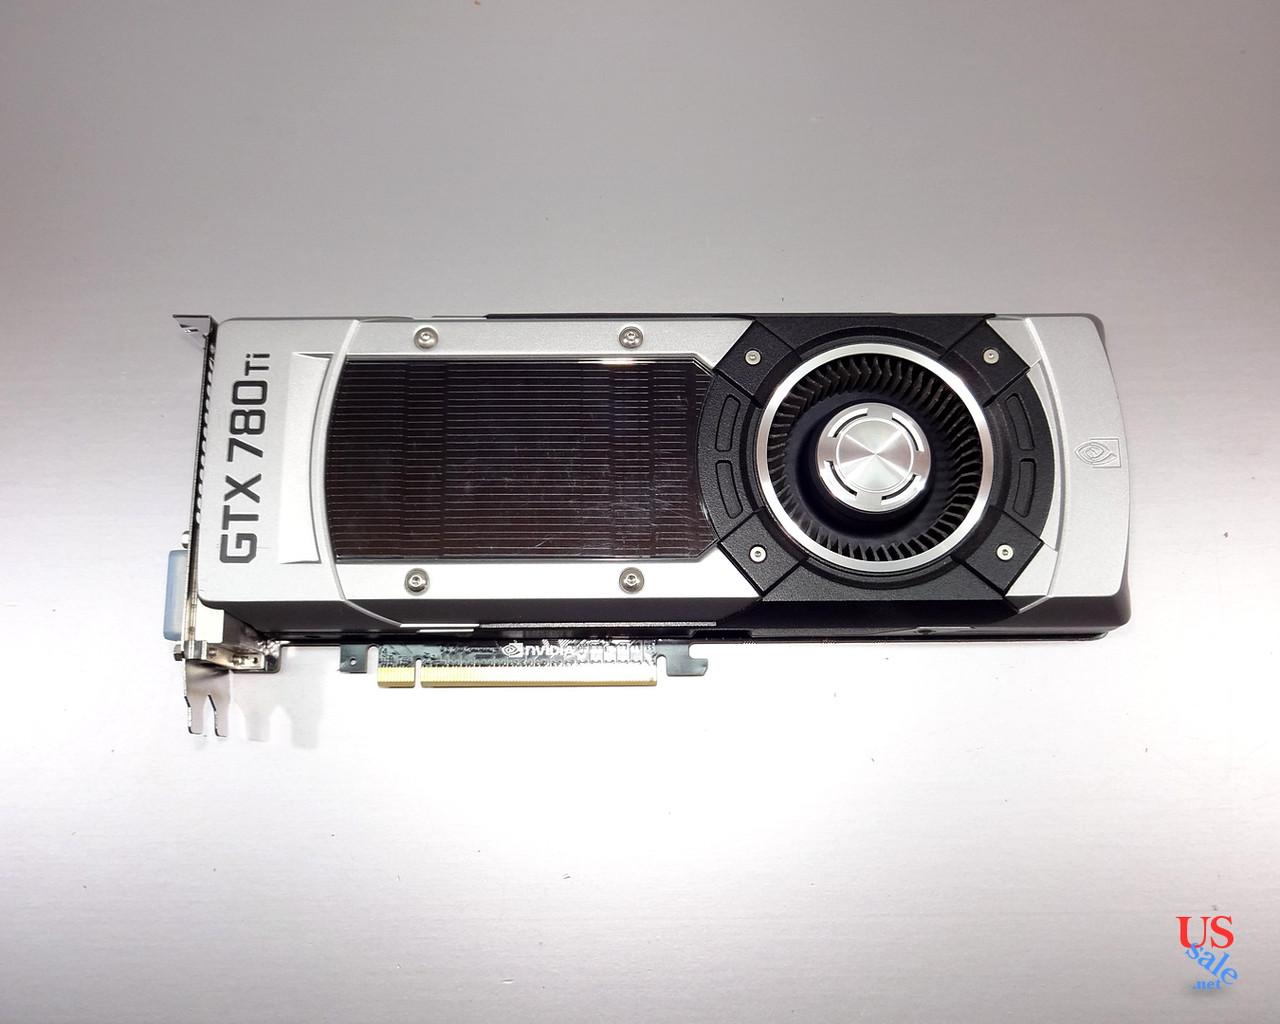 Видеокарта Asus GeForce GTX 780 Ti 3Gb. Покупка без риска! Гарантия!